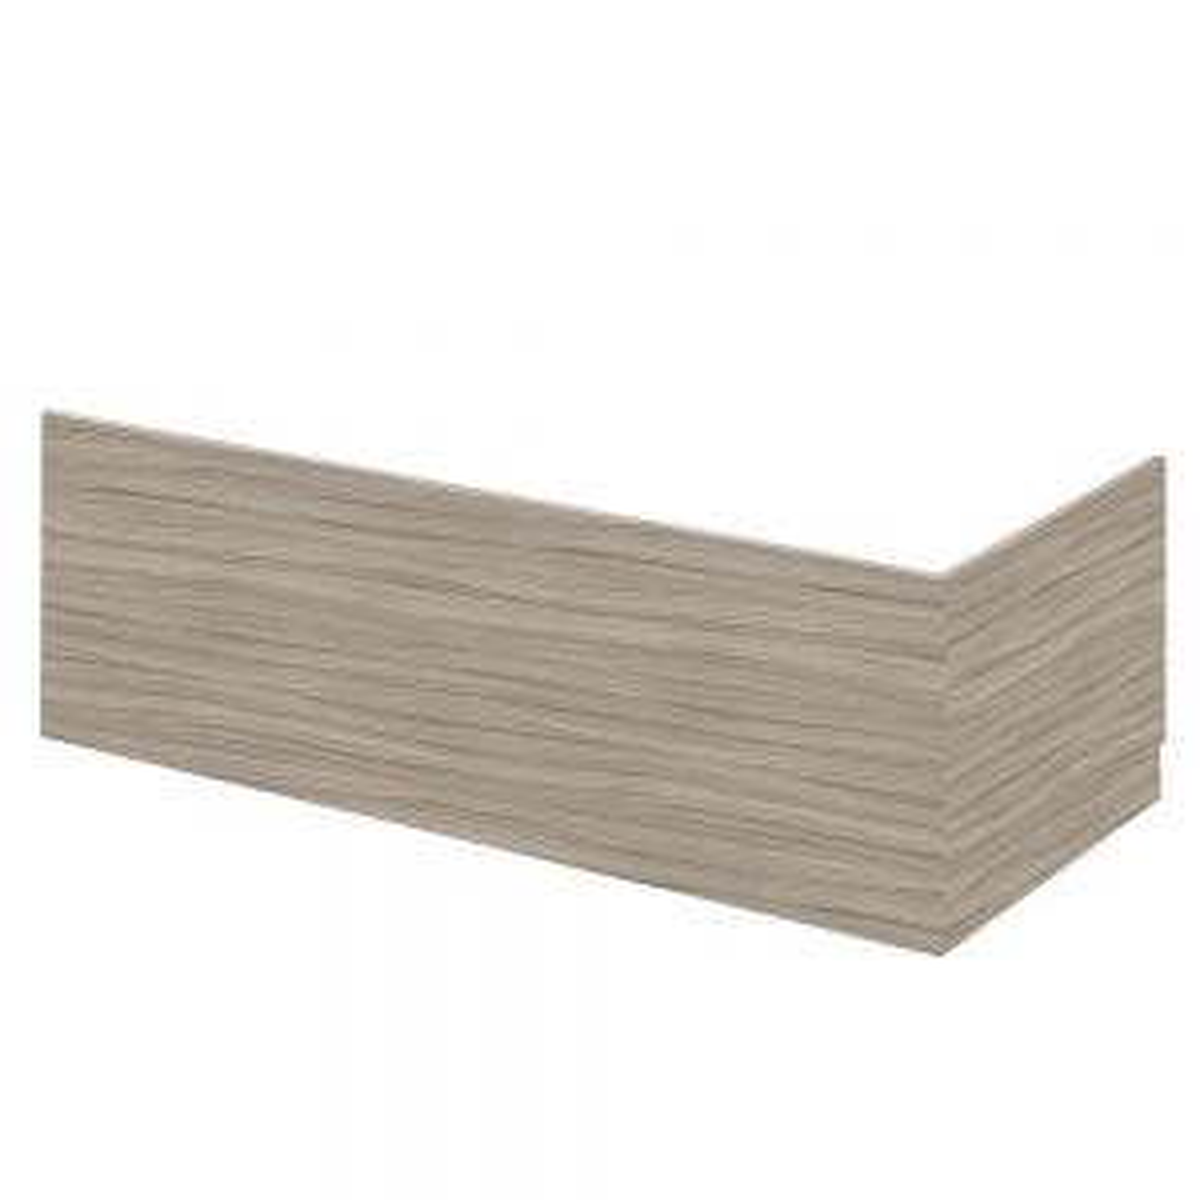 Premier Athena Driftwood End Panel 700mm